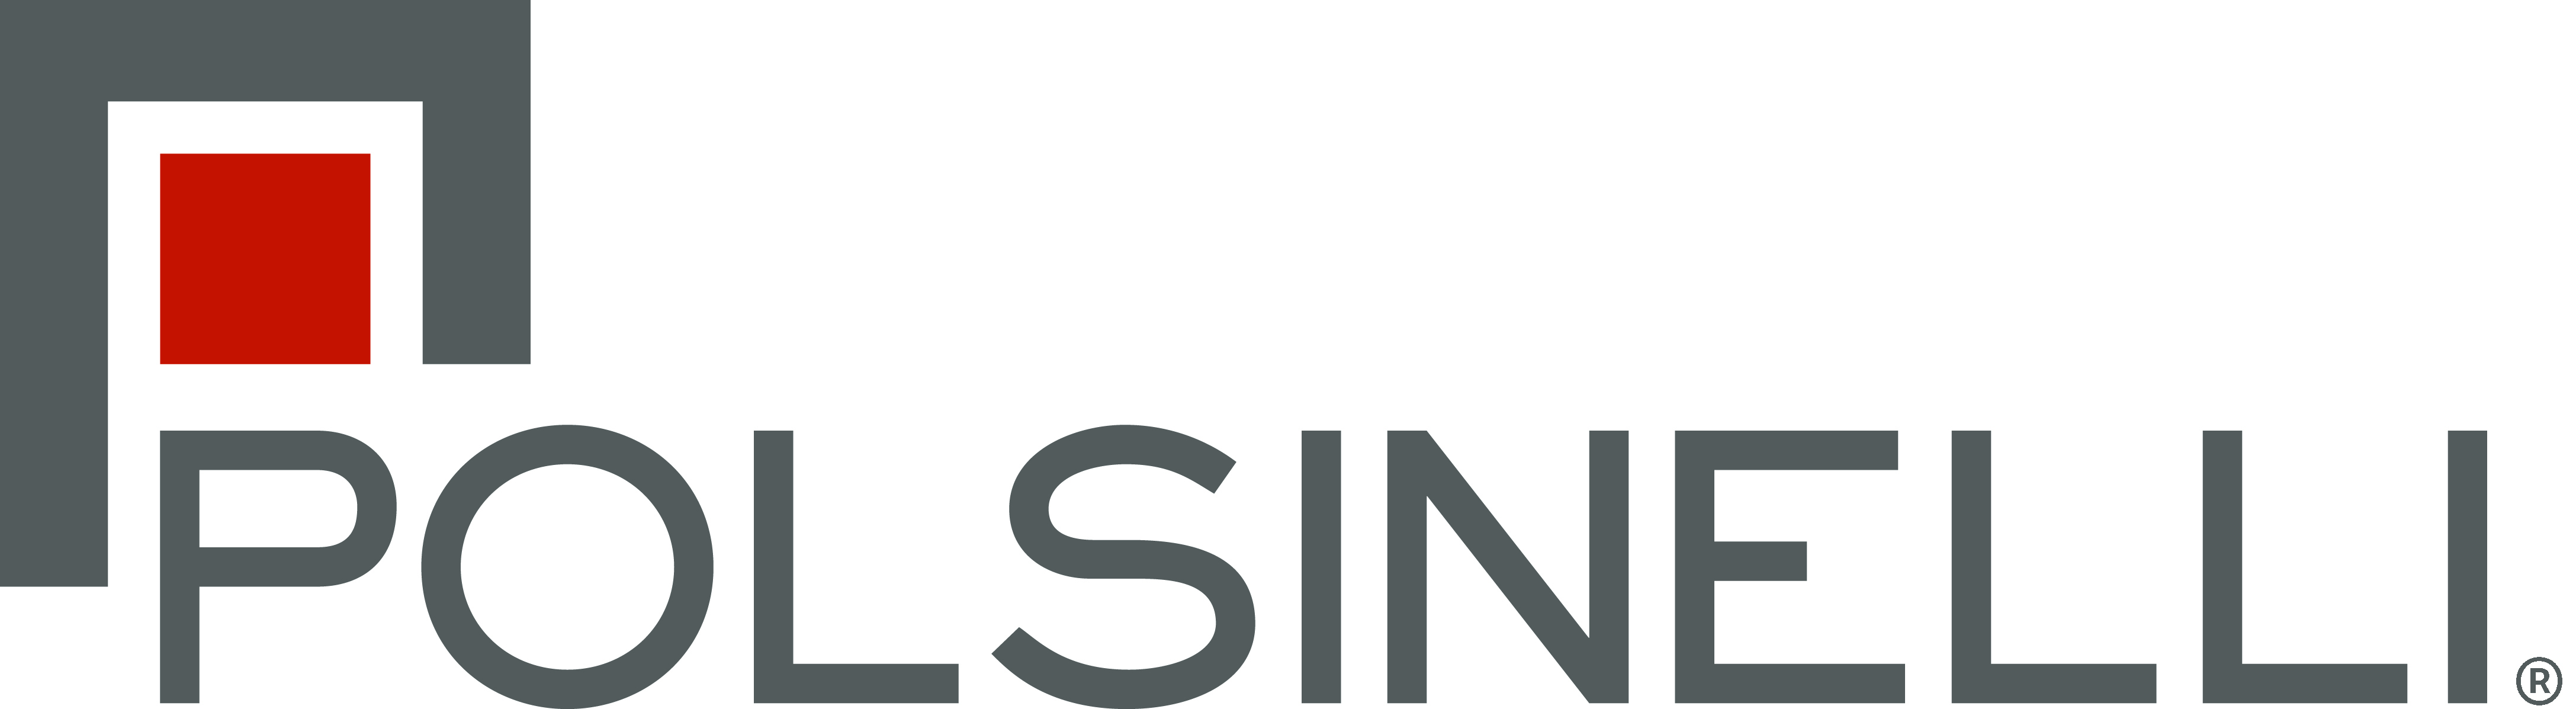 Polsinelli_Color_logo